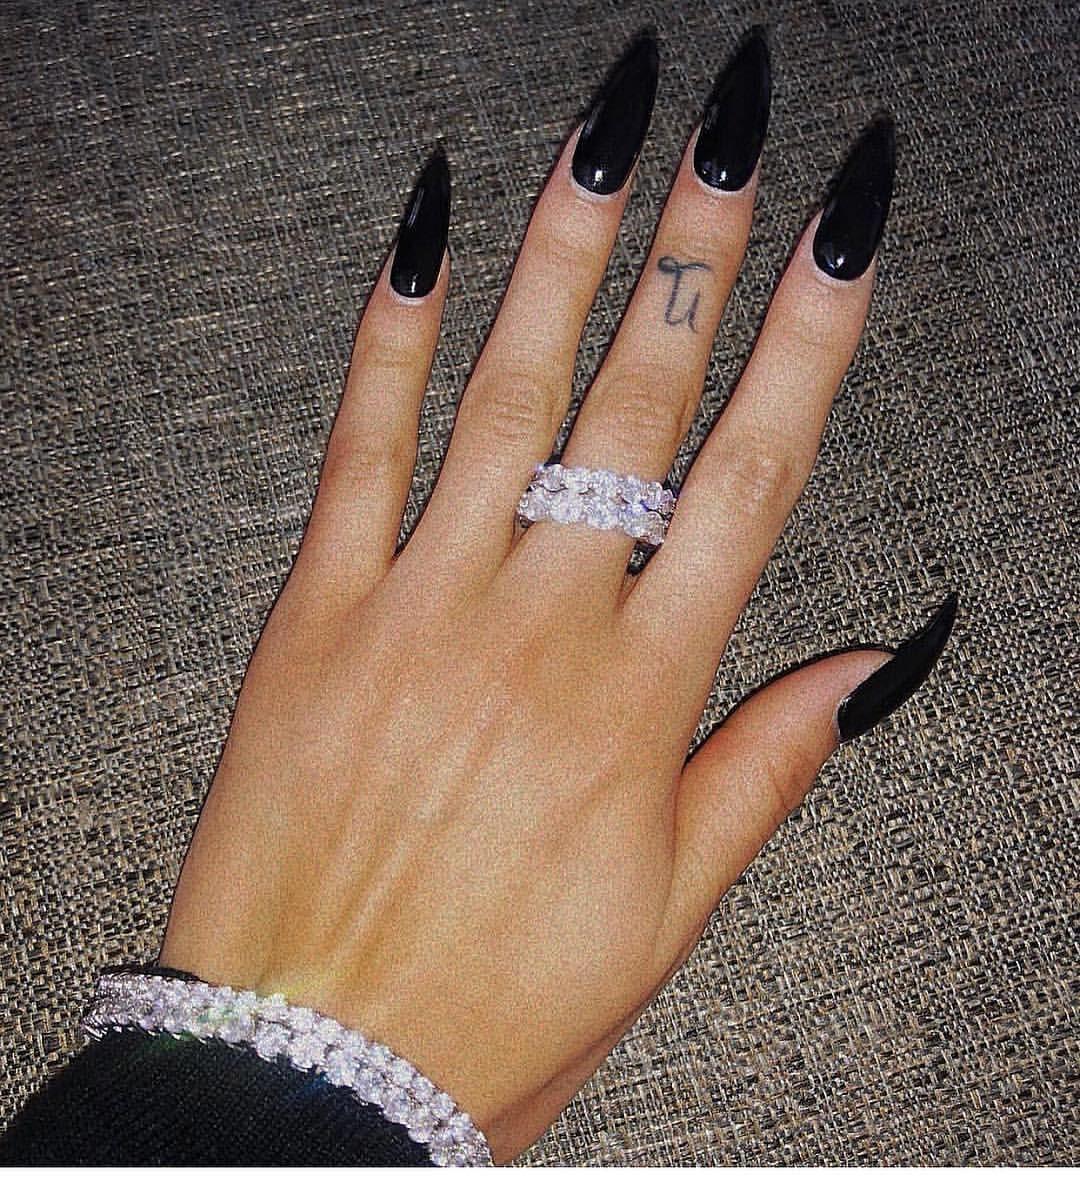 Pin By Joanna Andreeva On Nails In 2020 Black Acrylic Nails Goth Nails Dream Nails